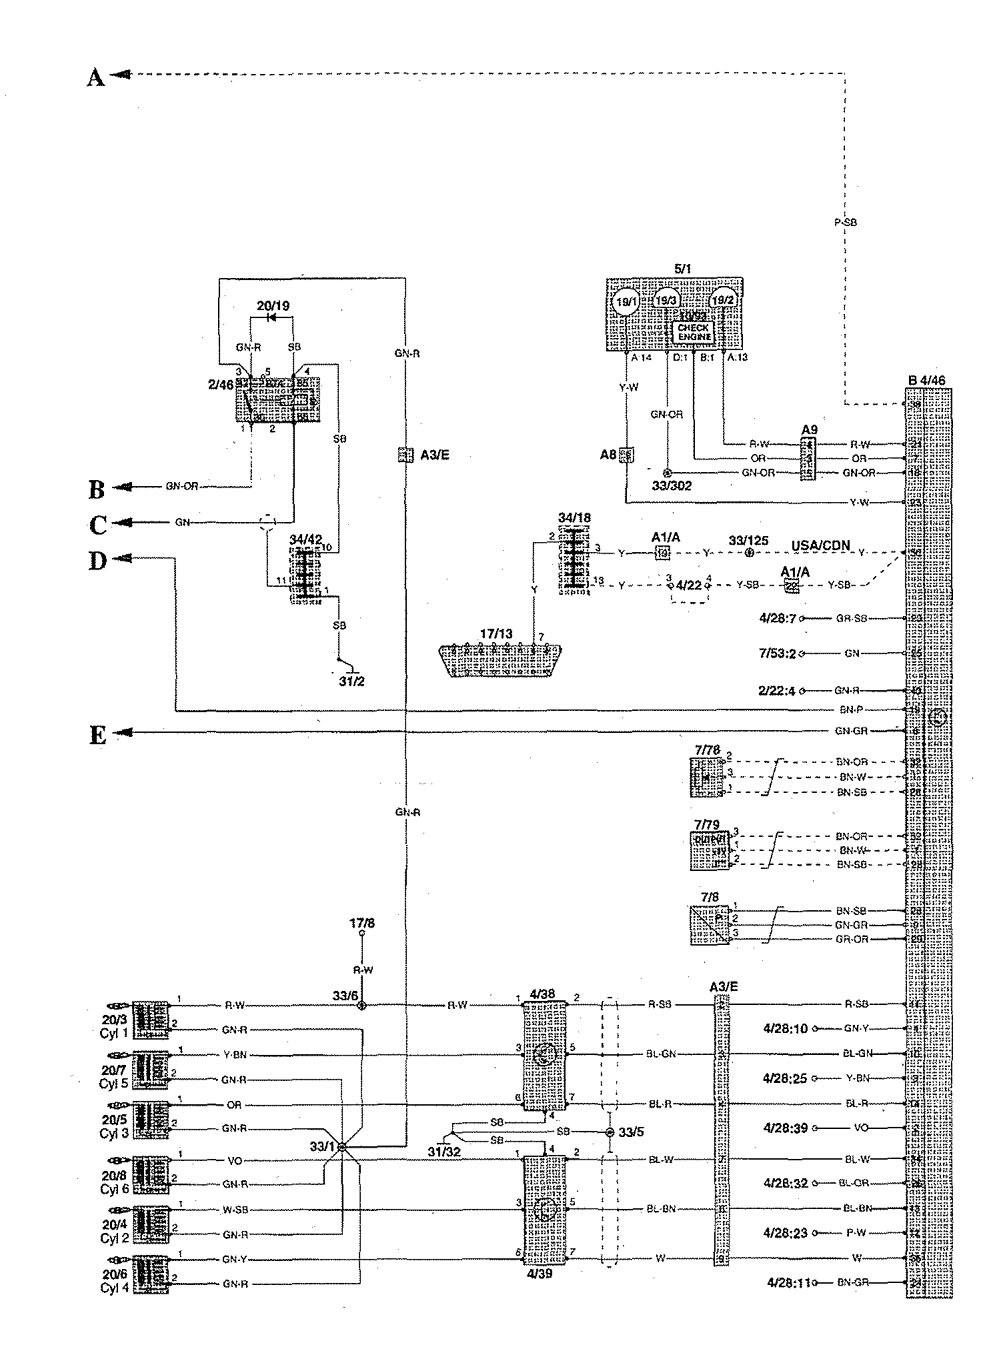 Wiring Diagram Volvo S90 - Covuk.rep-mannheim.de • on 1997 volvo v90 engine schematic, 1998 volvo v70 wiring diagram, 1997 volvo s90 engine, 1995 volvo 960 wiring diagram, 2000 volvo v70 wiring diagram, 1995 volvo 940 wiring diagram,